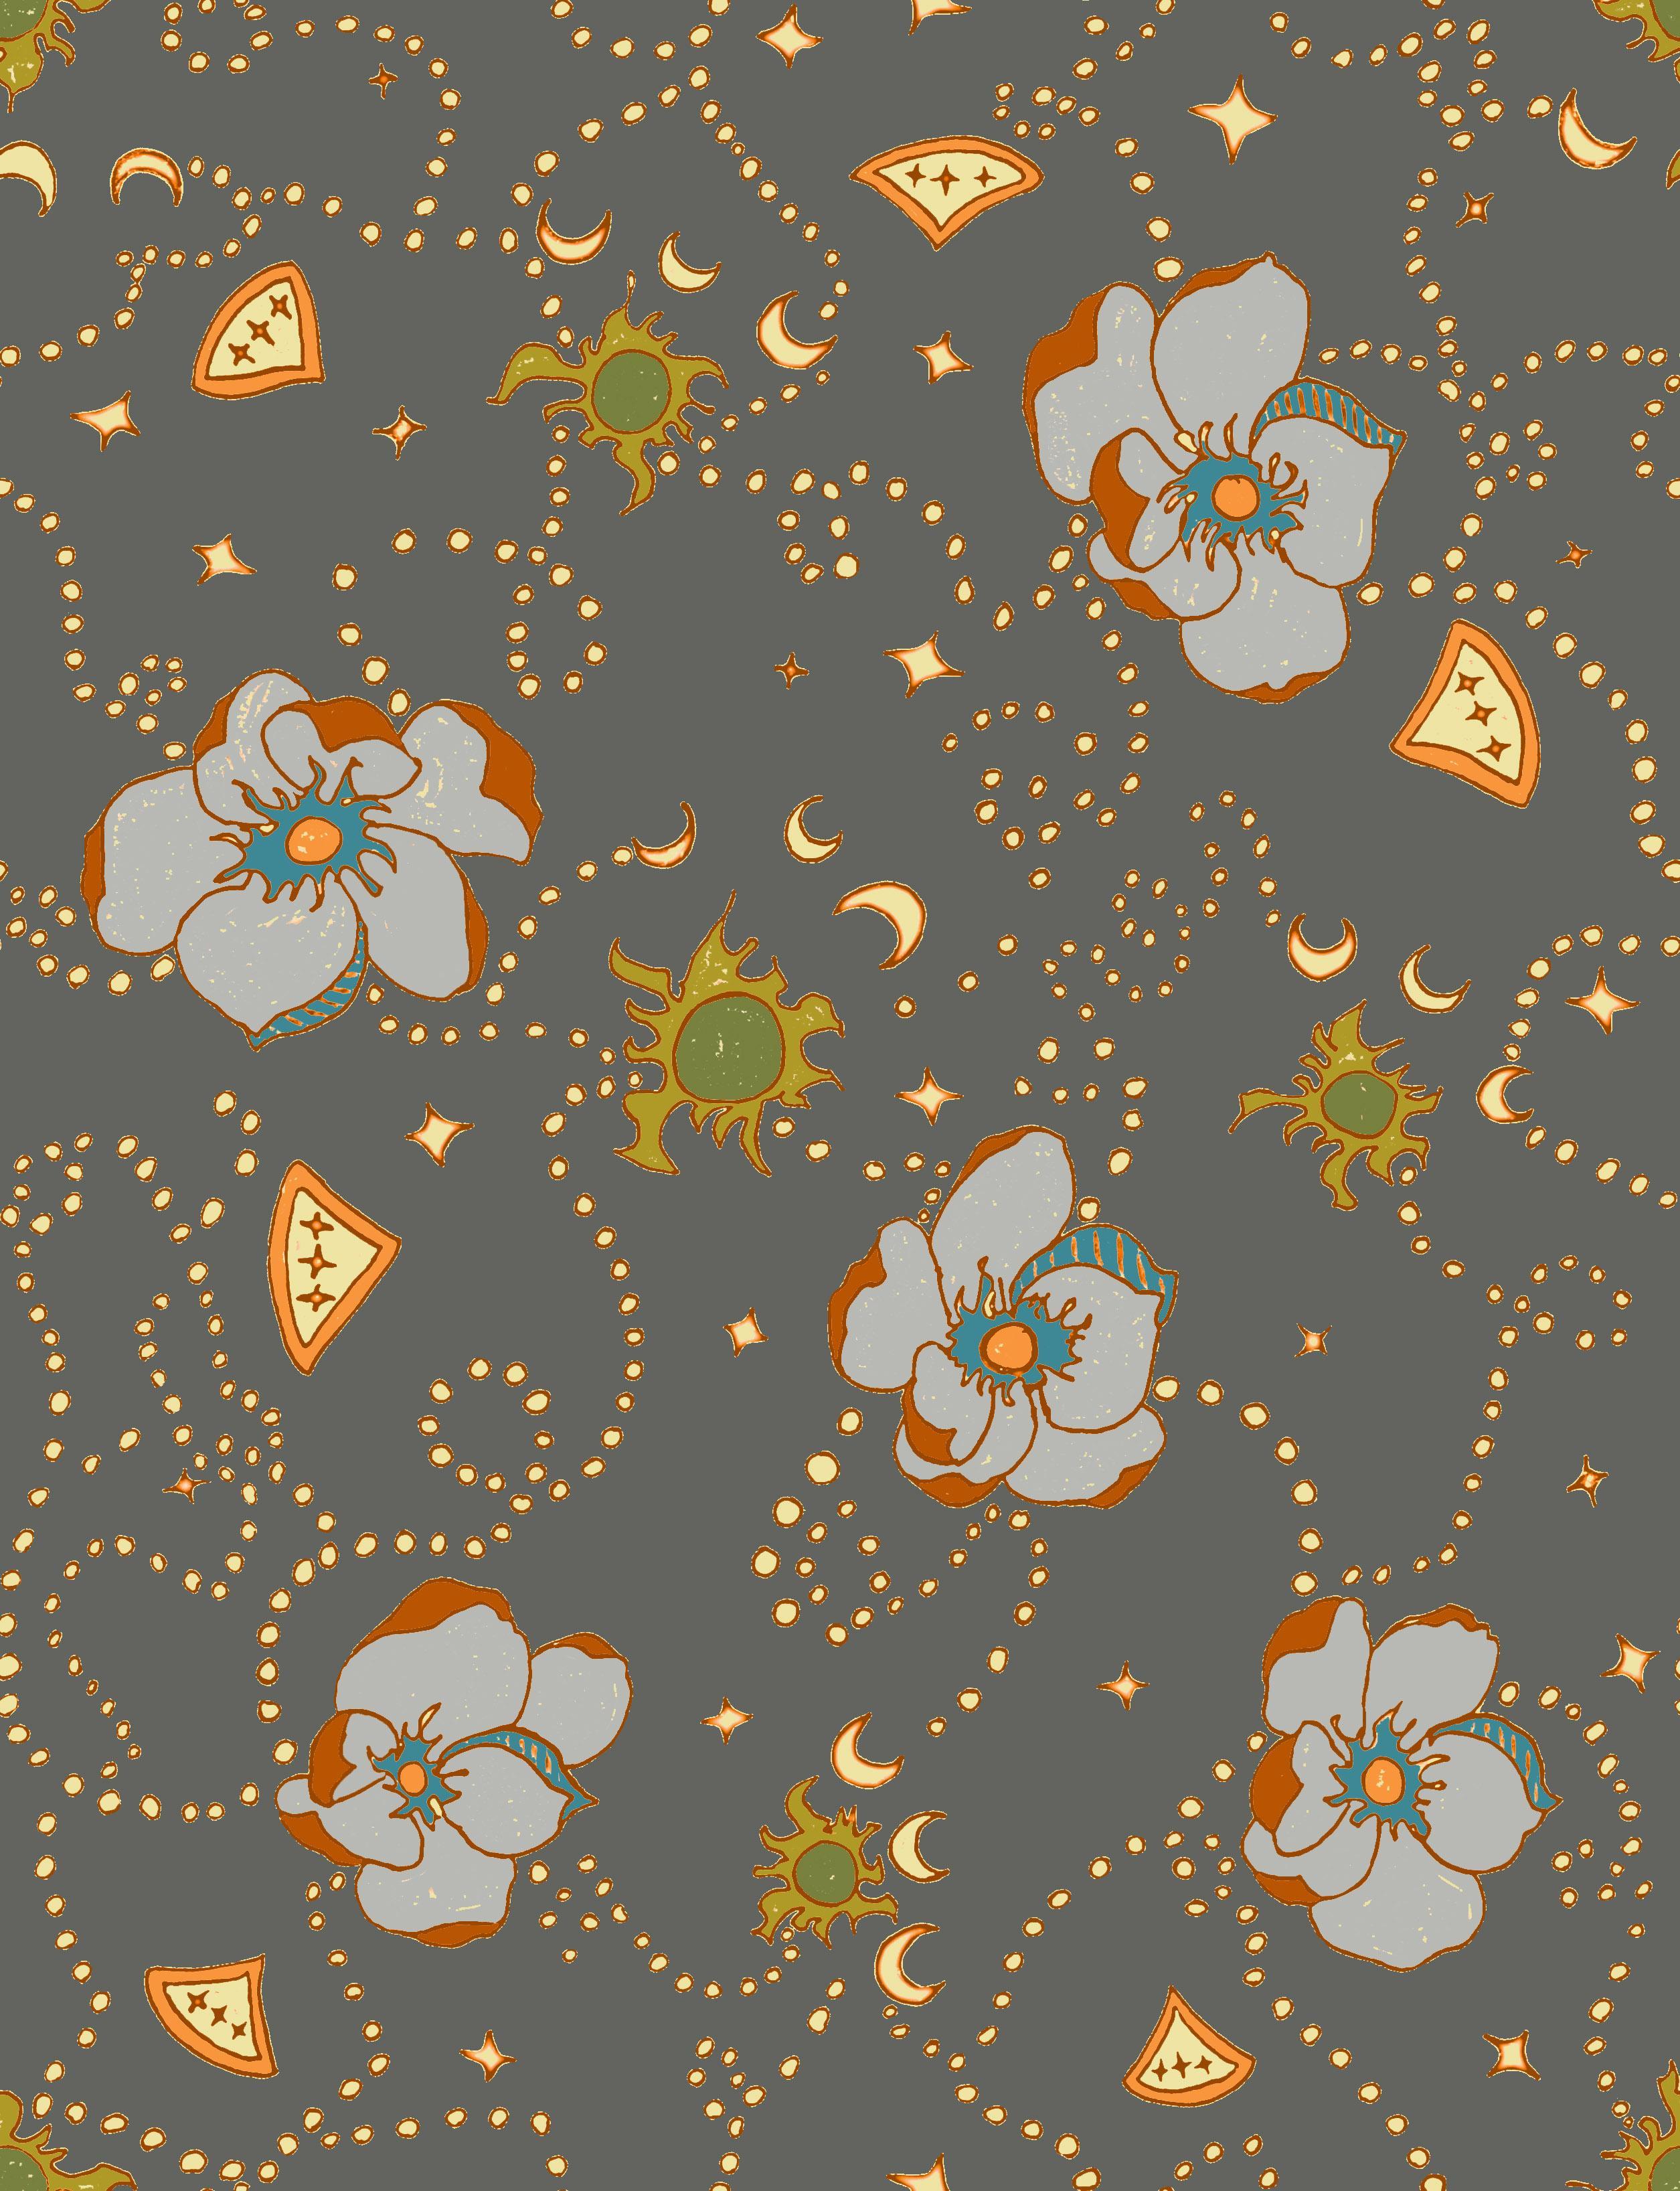 Sun, Moon, Stars & Magnolias - image 8 - student project